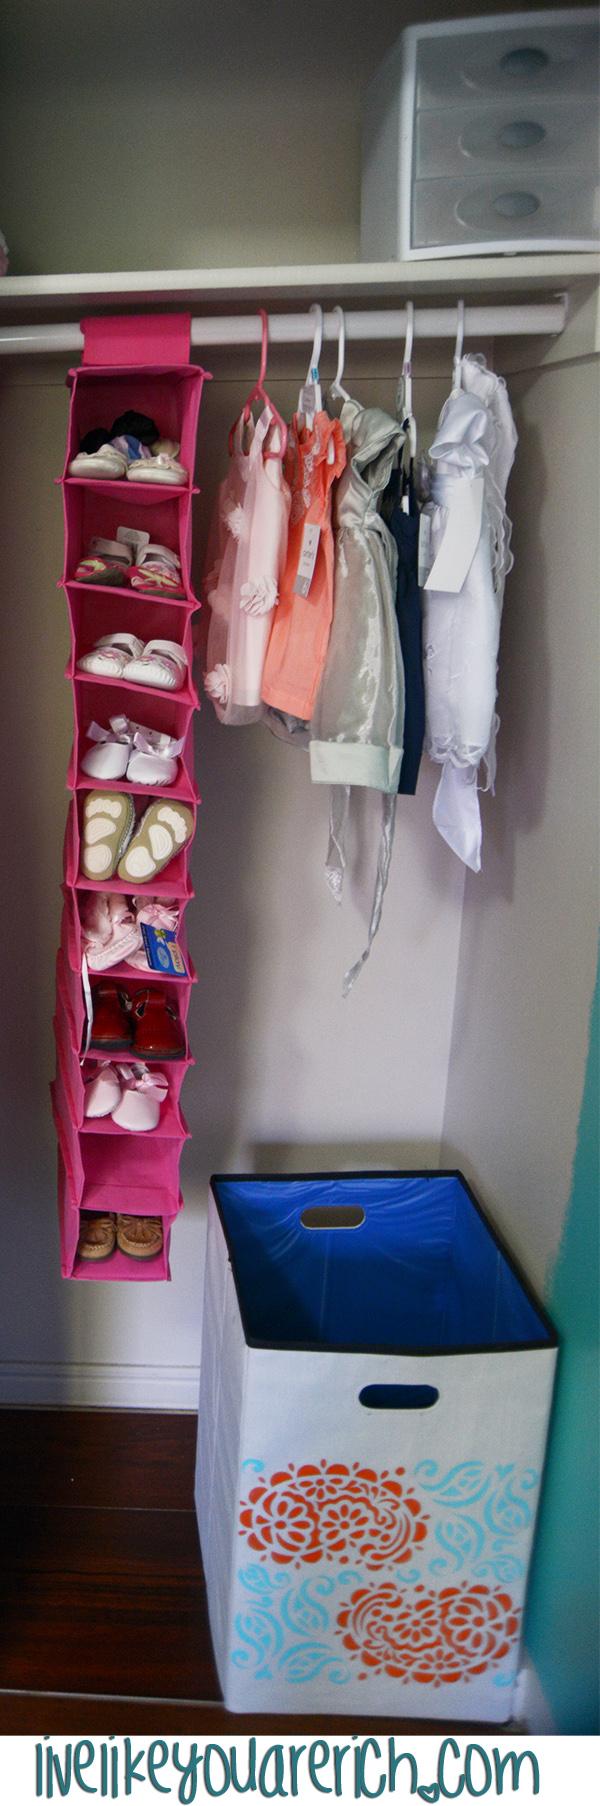 Nursery Closet Organization and Decor